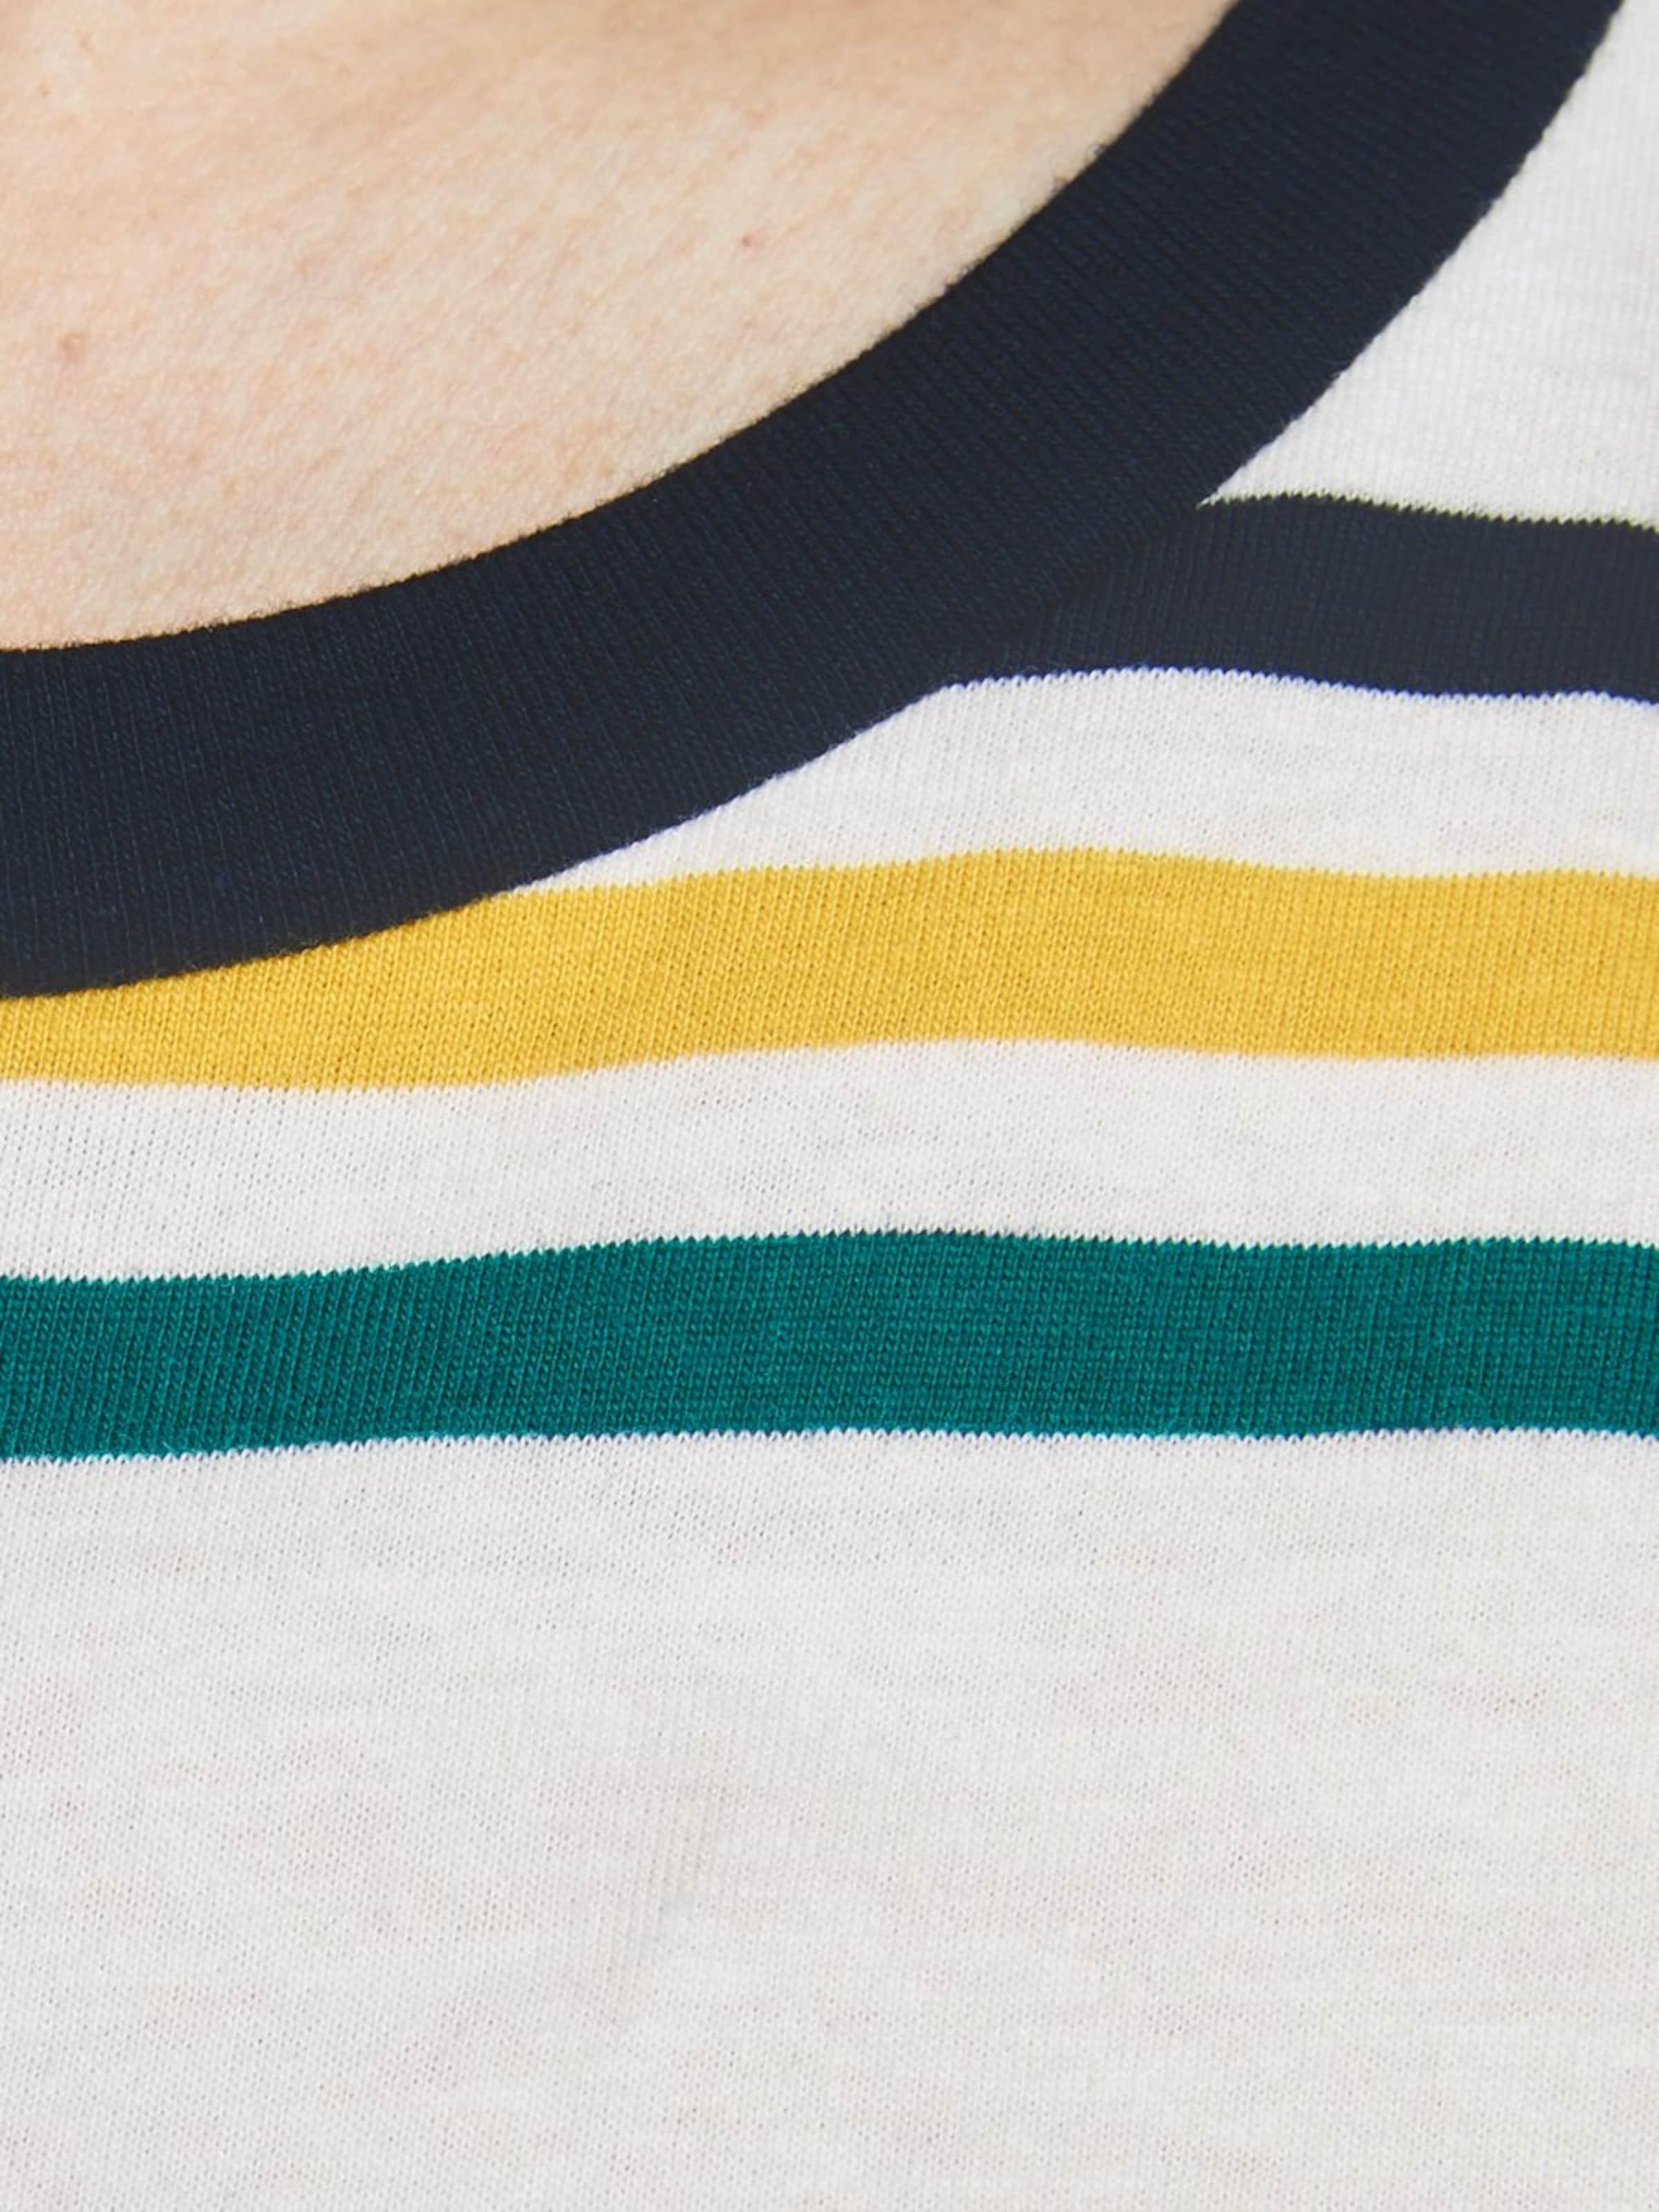 Jackamp; GelbPetrol Weiß shirt Jones T Schwarz In WH2IED9